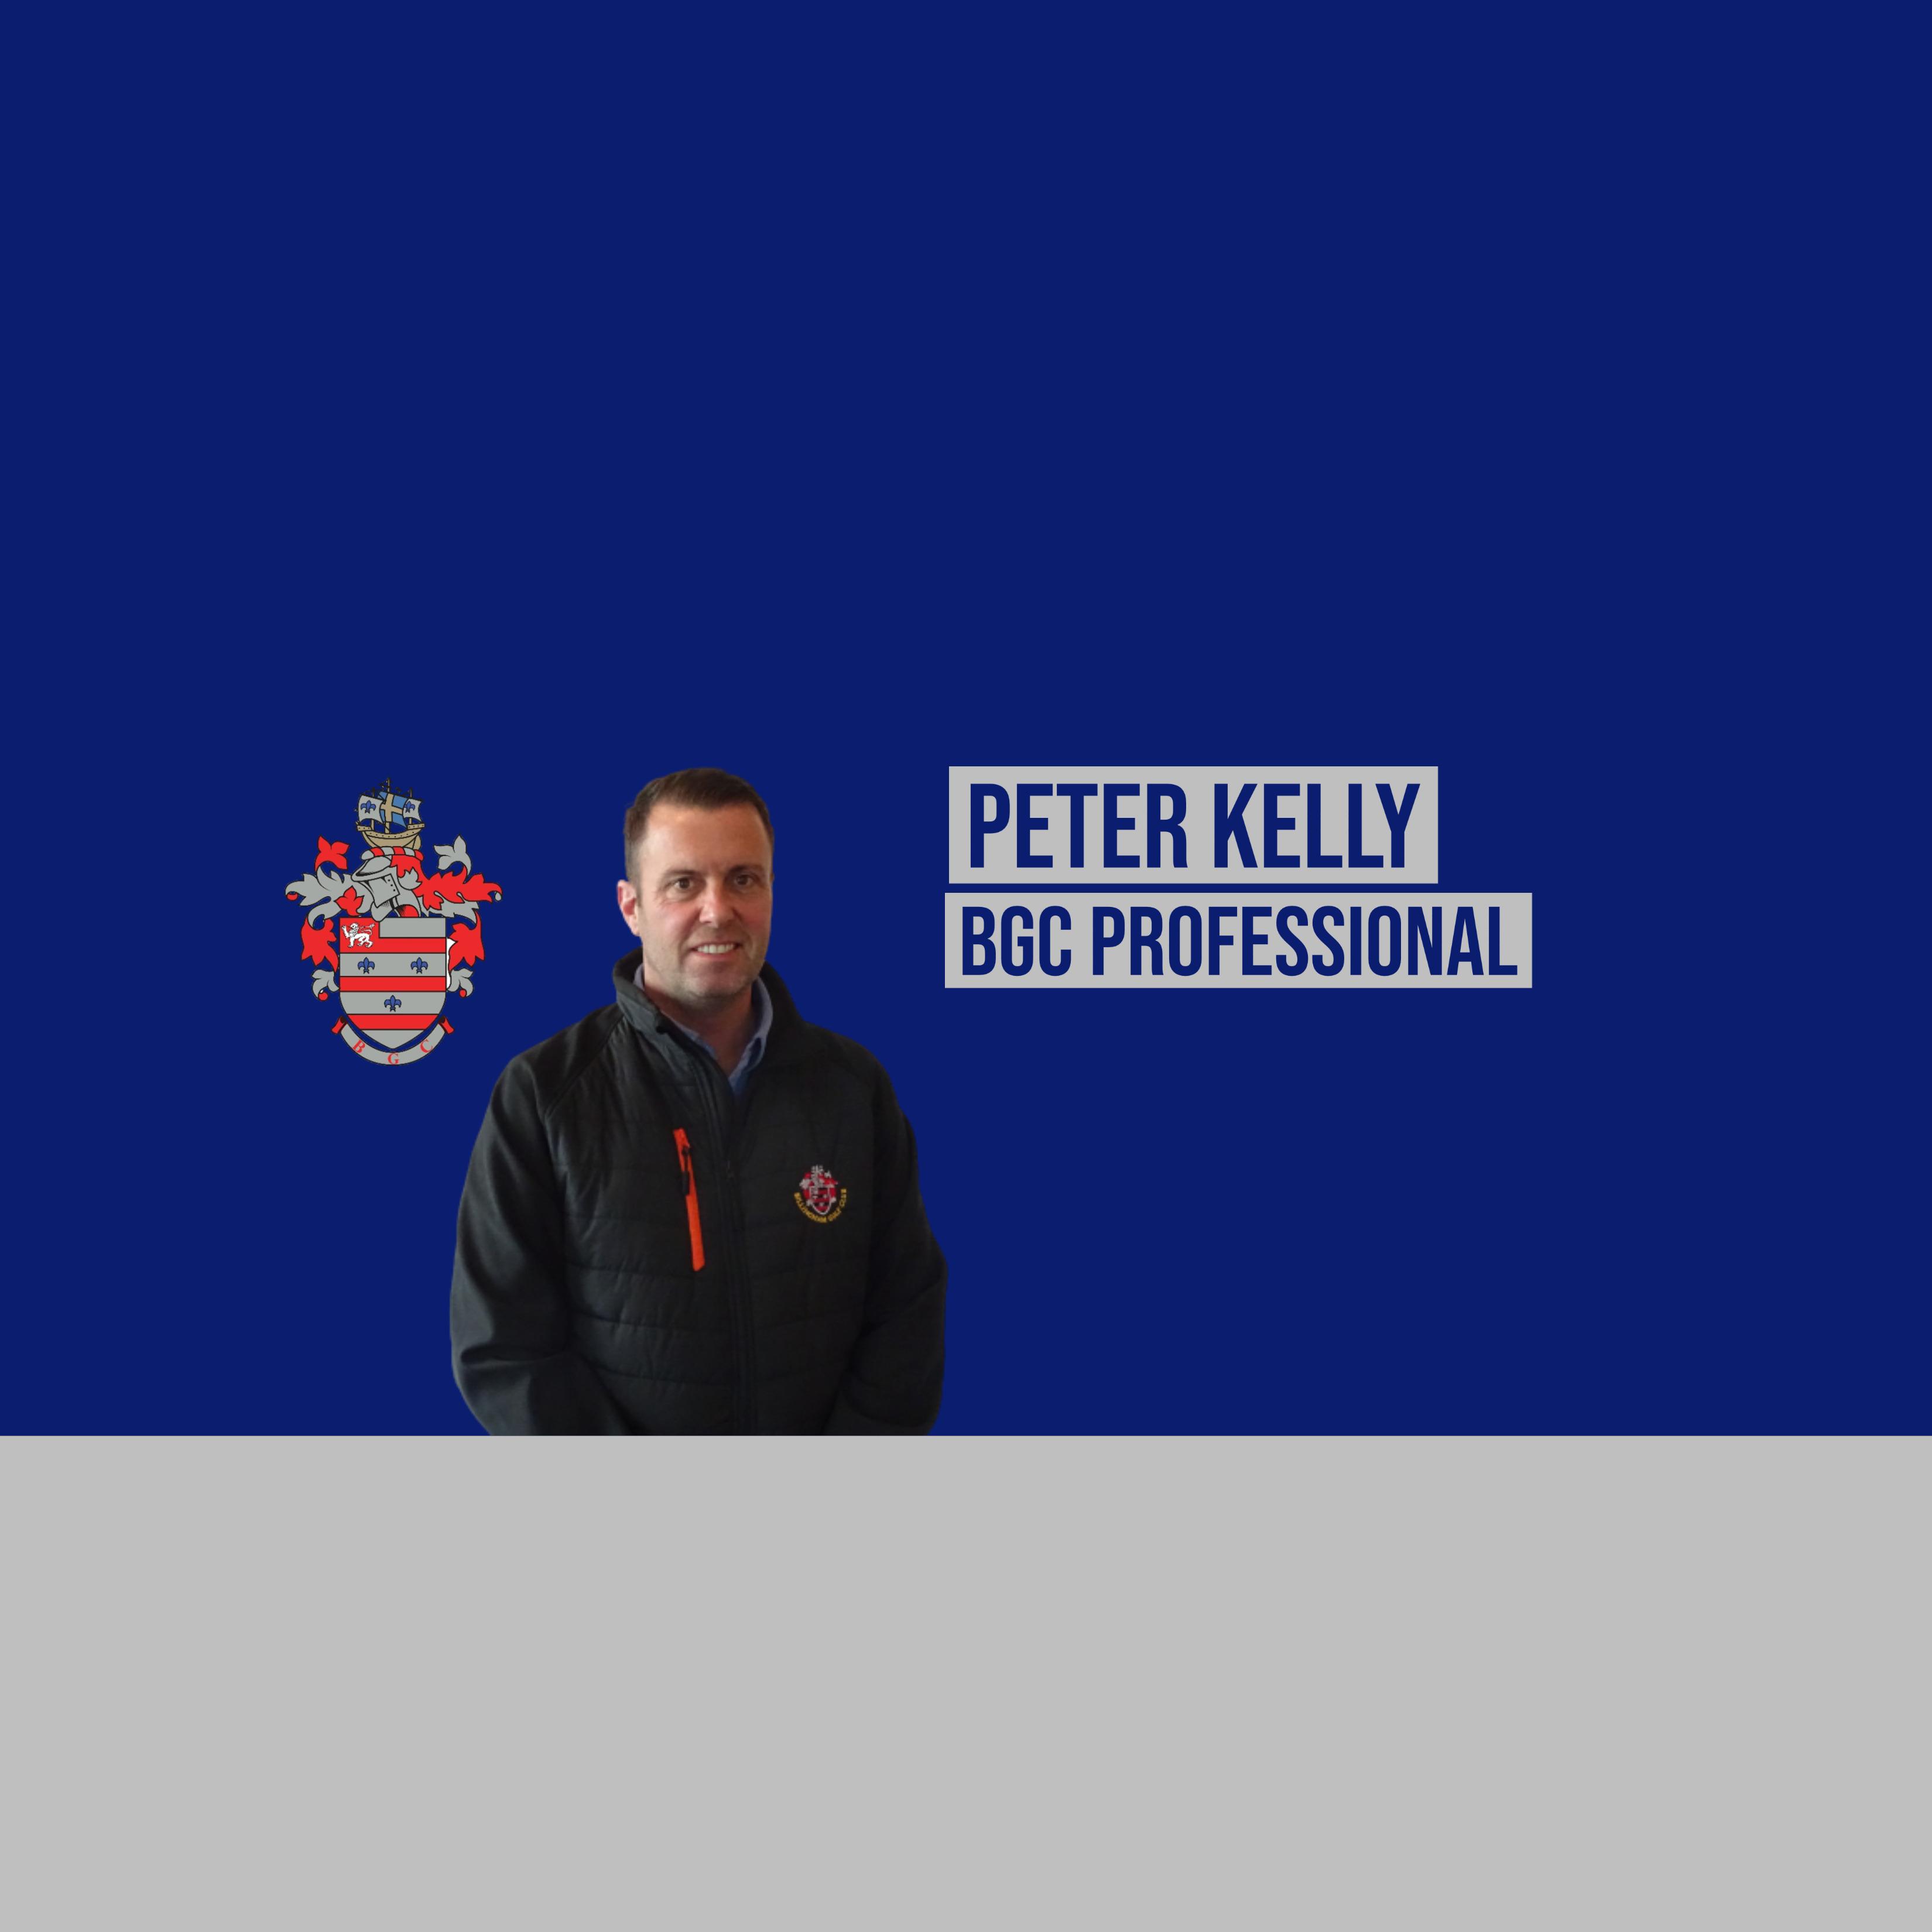 Peter Kelly (BGC Professional)